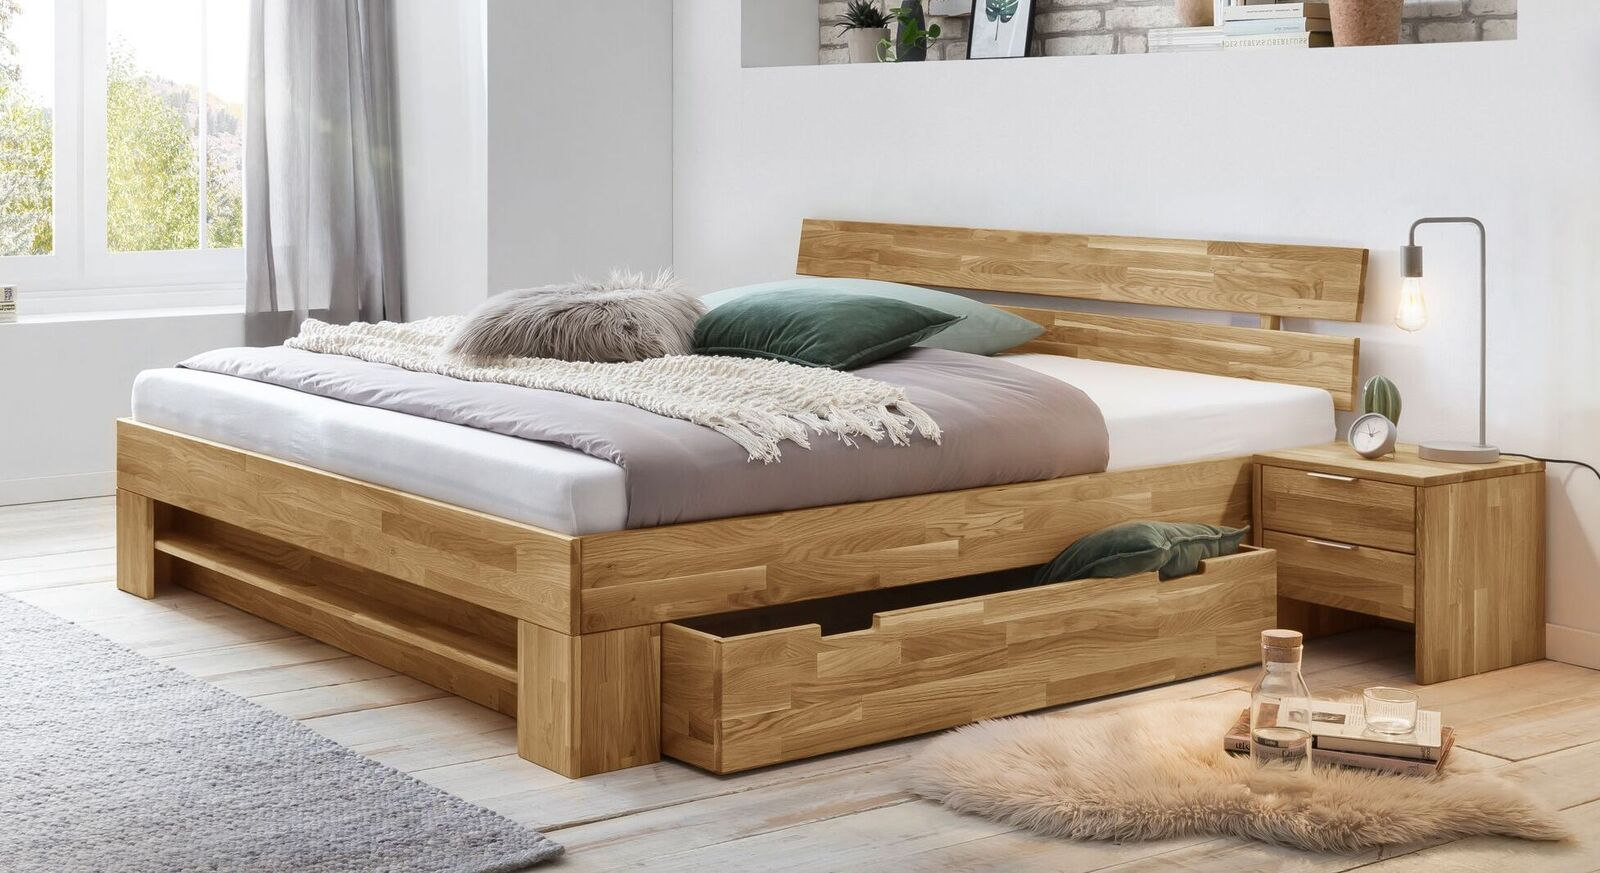 Schubkastenbett Kanata inklusive Regal